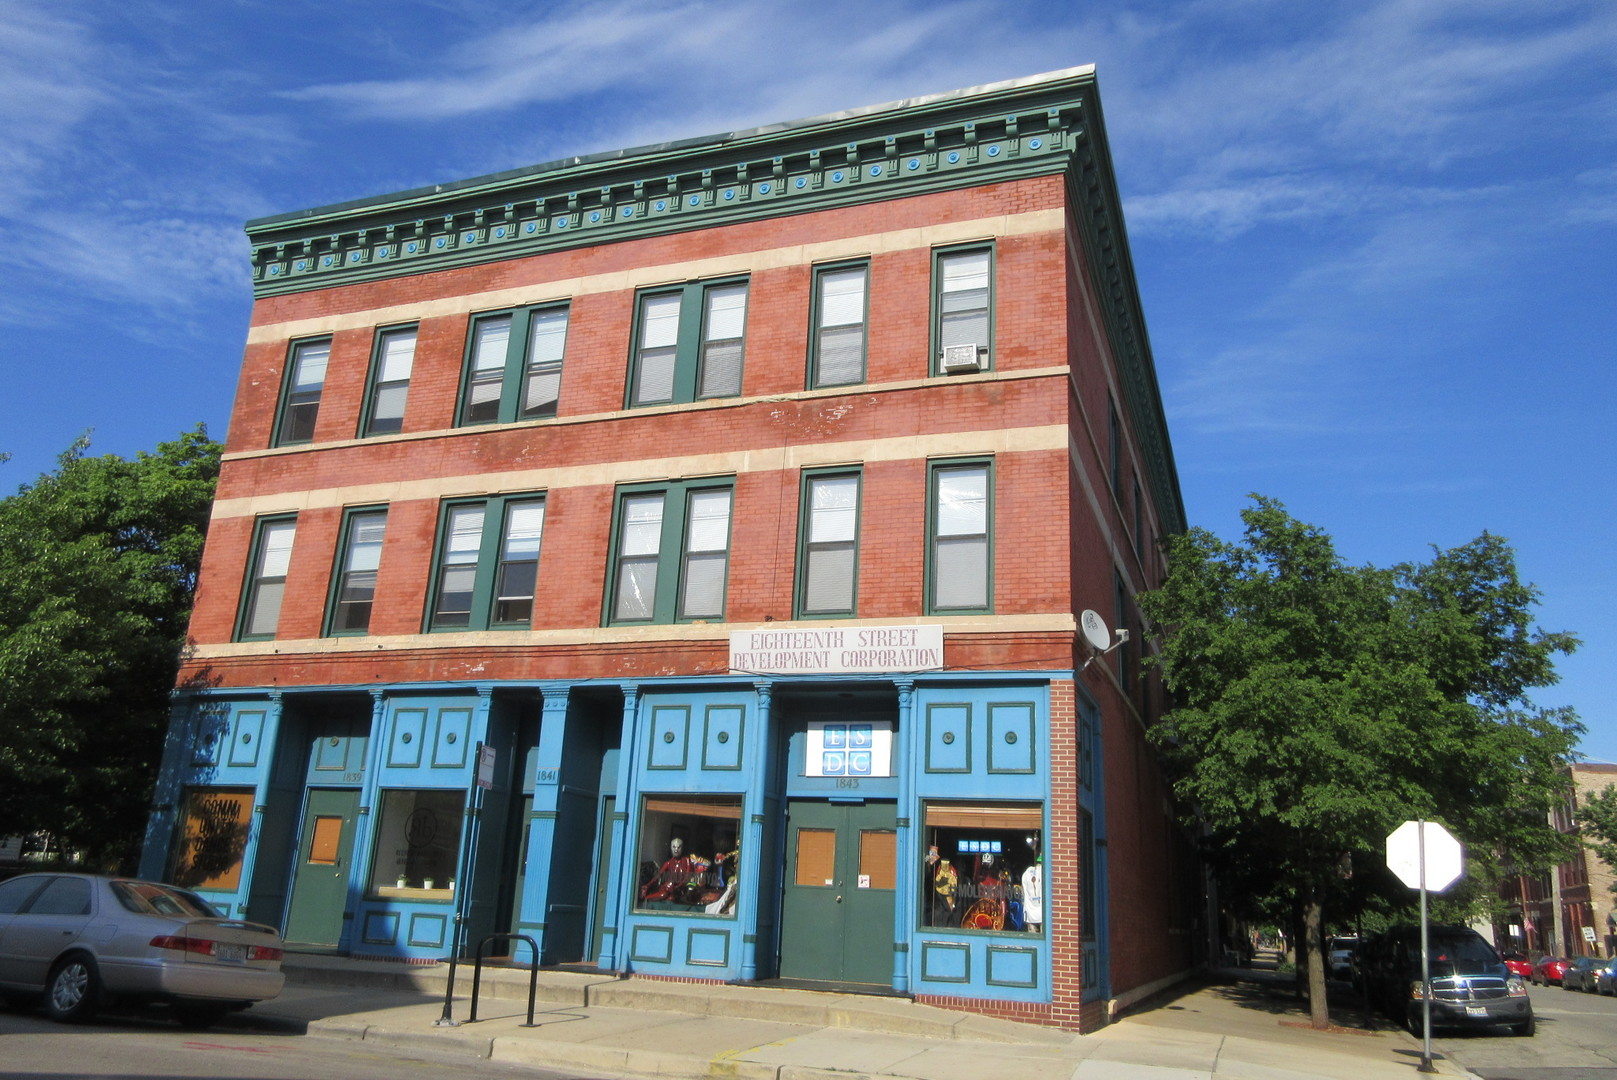 1841 S Carpenter Street, Chicago, IL 60608